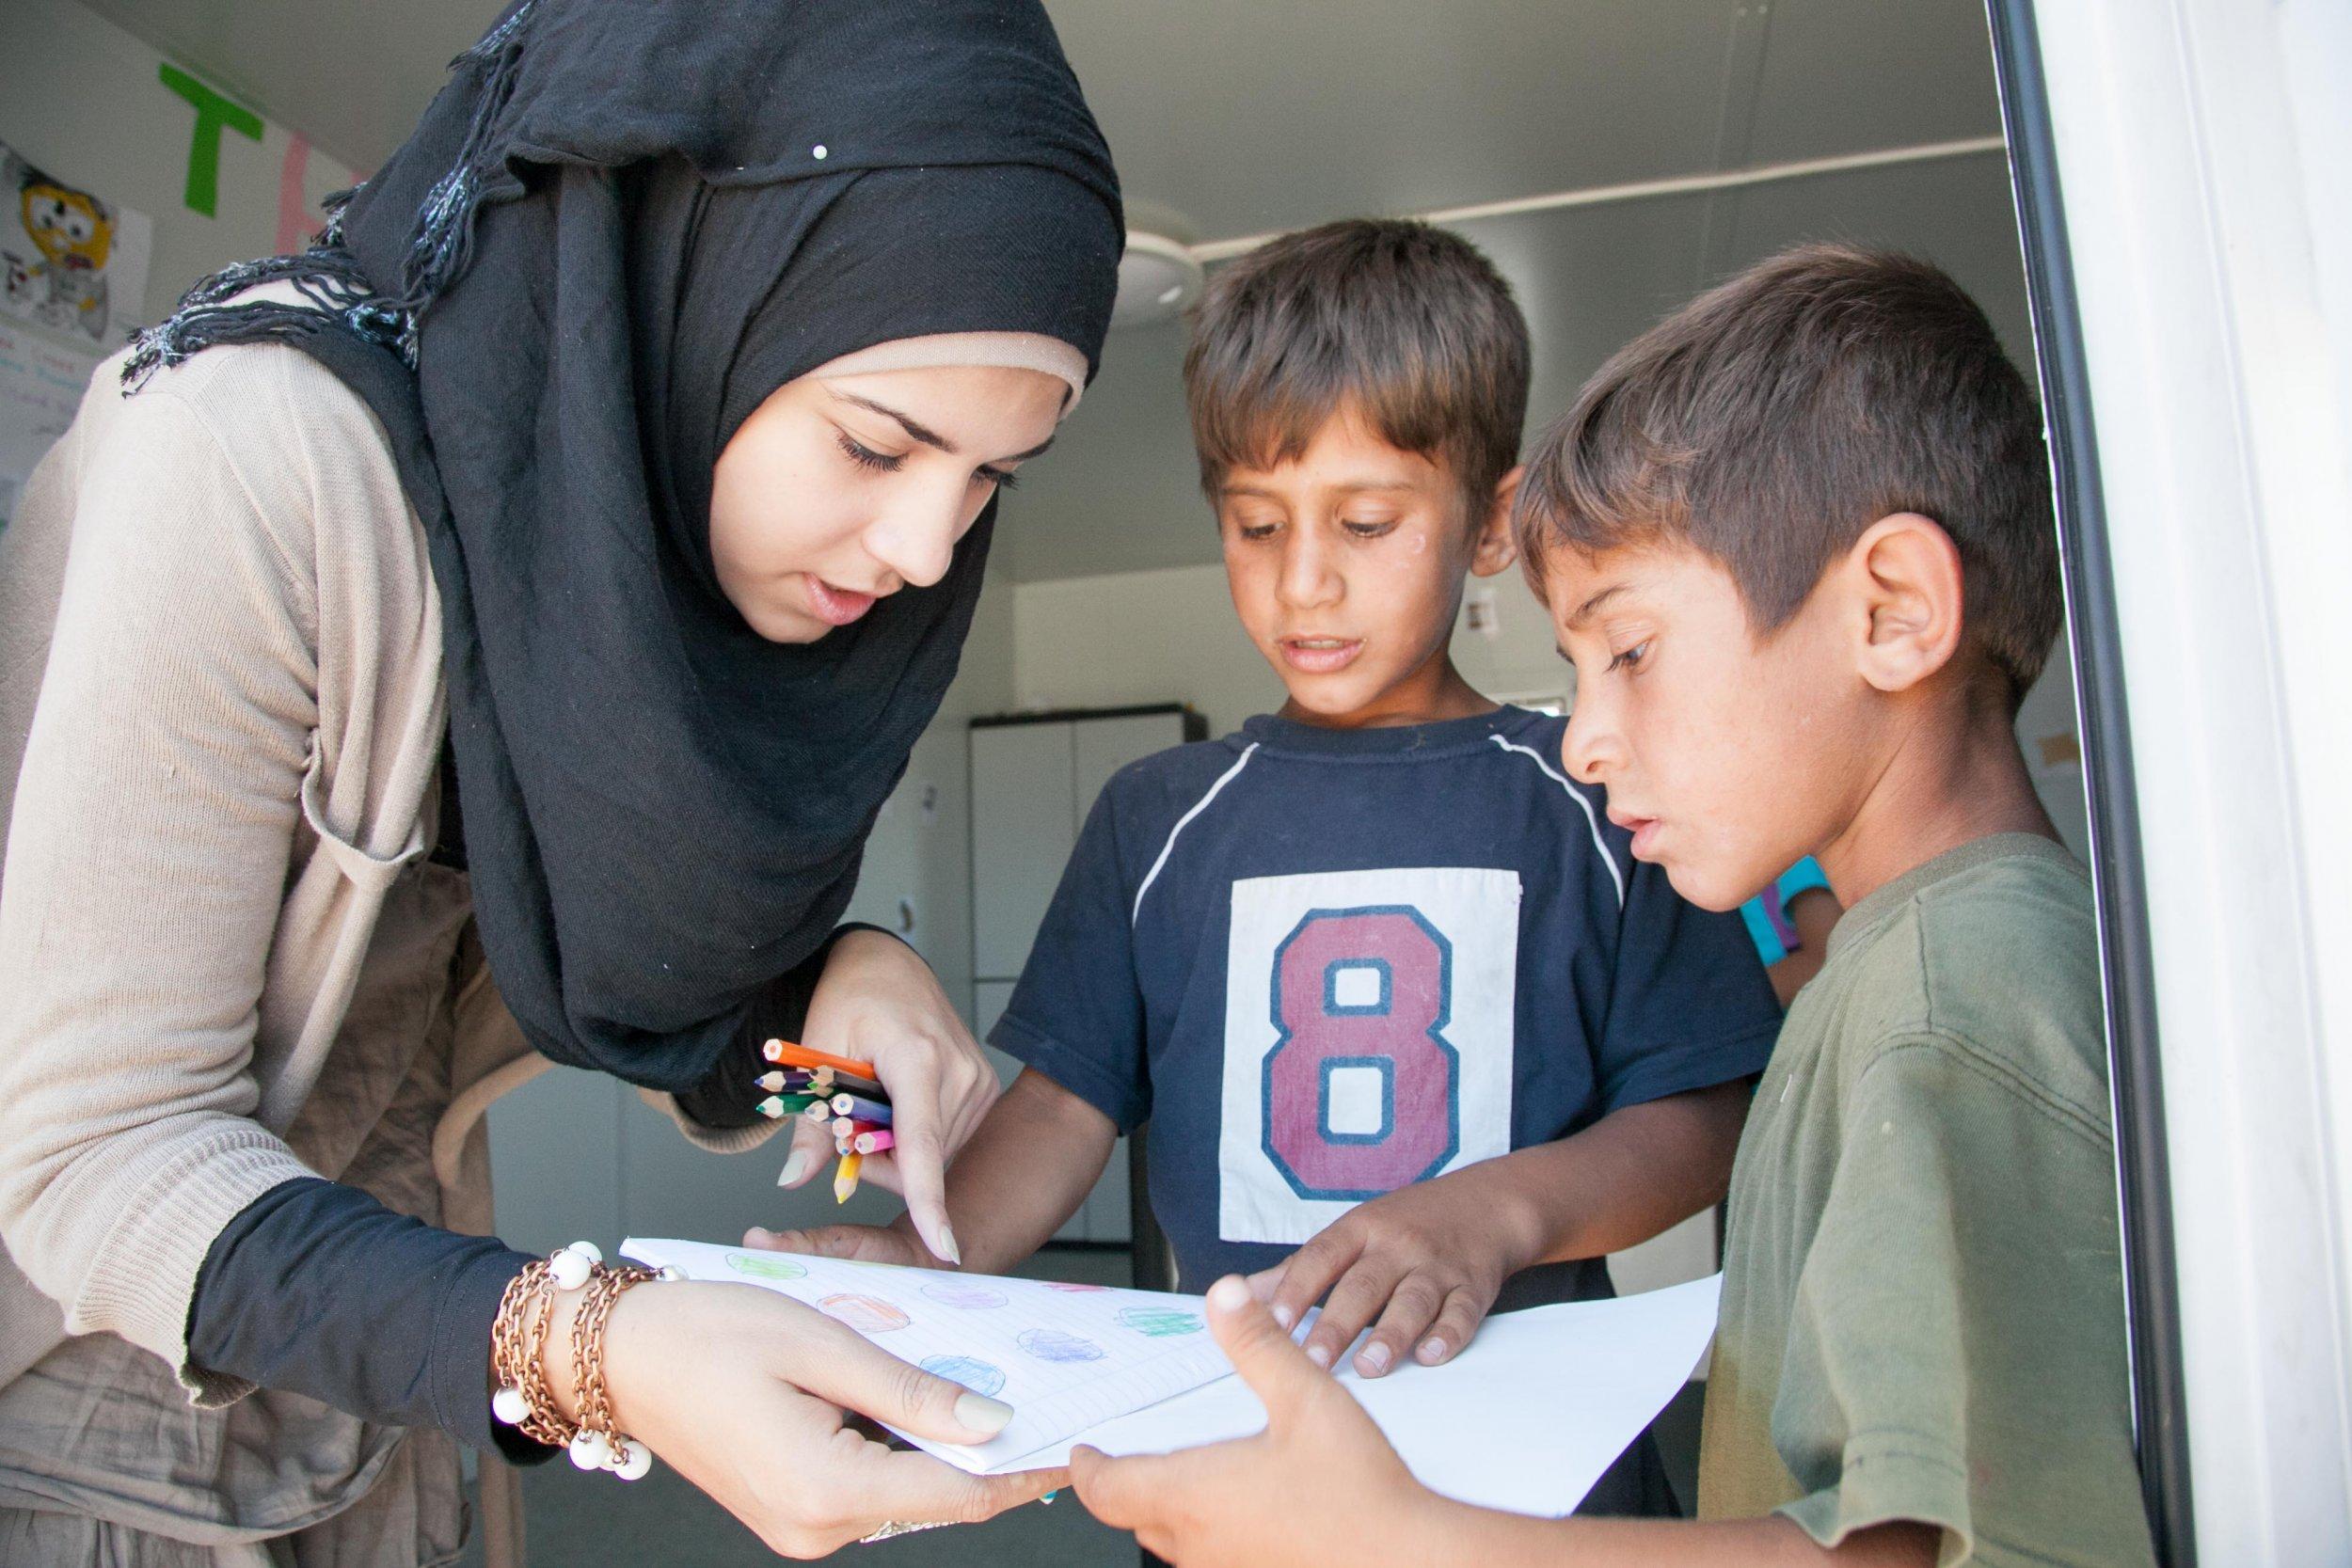 unaccompanied_child_refugees_0906